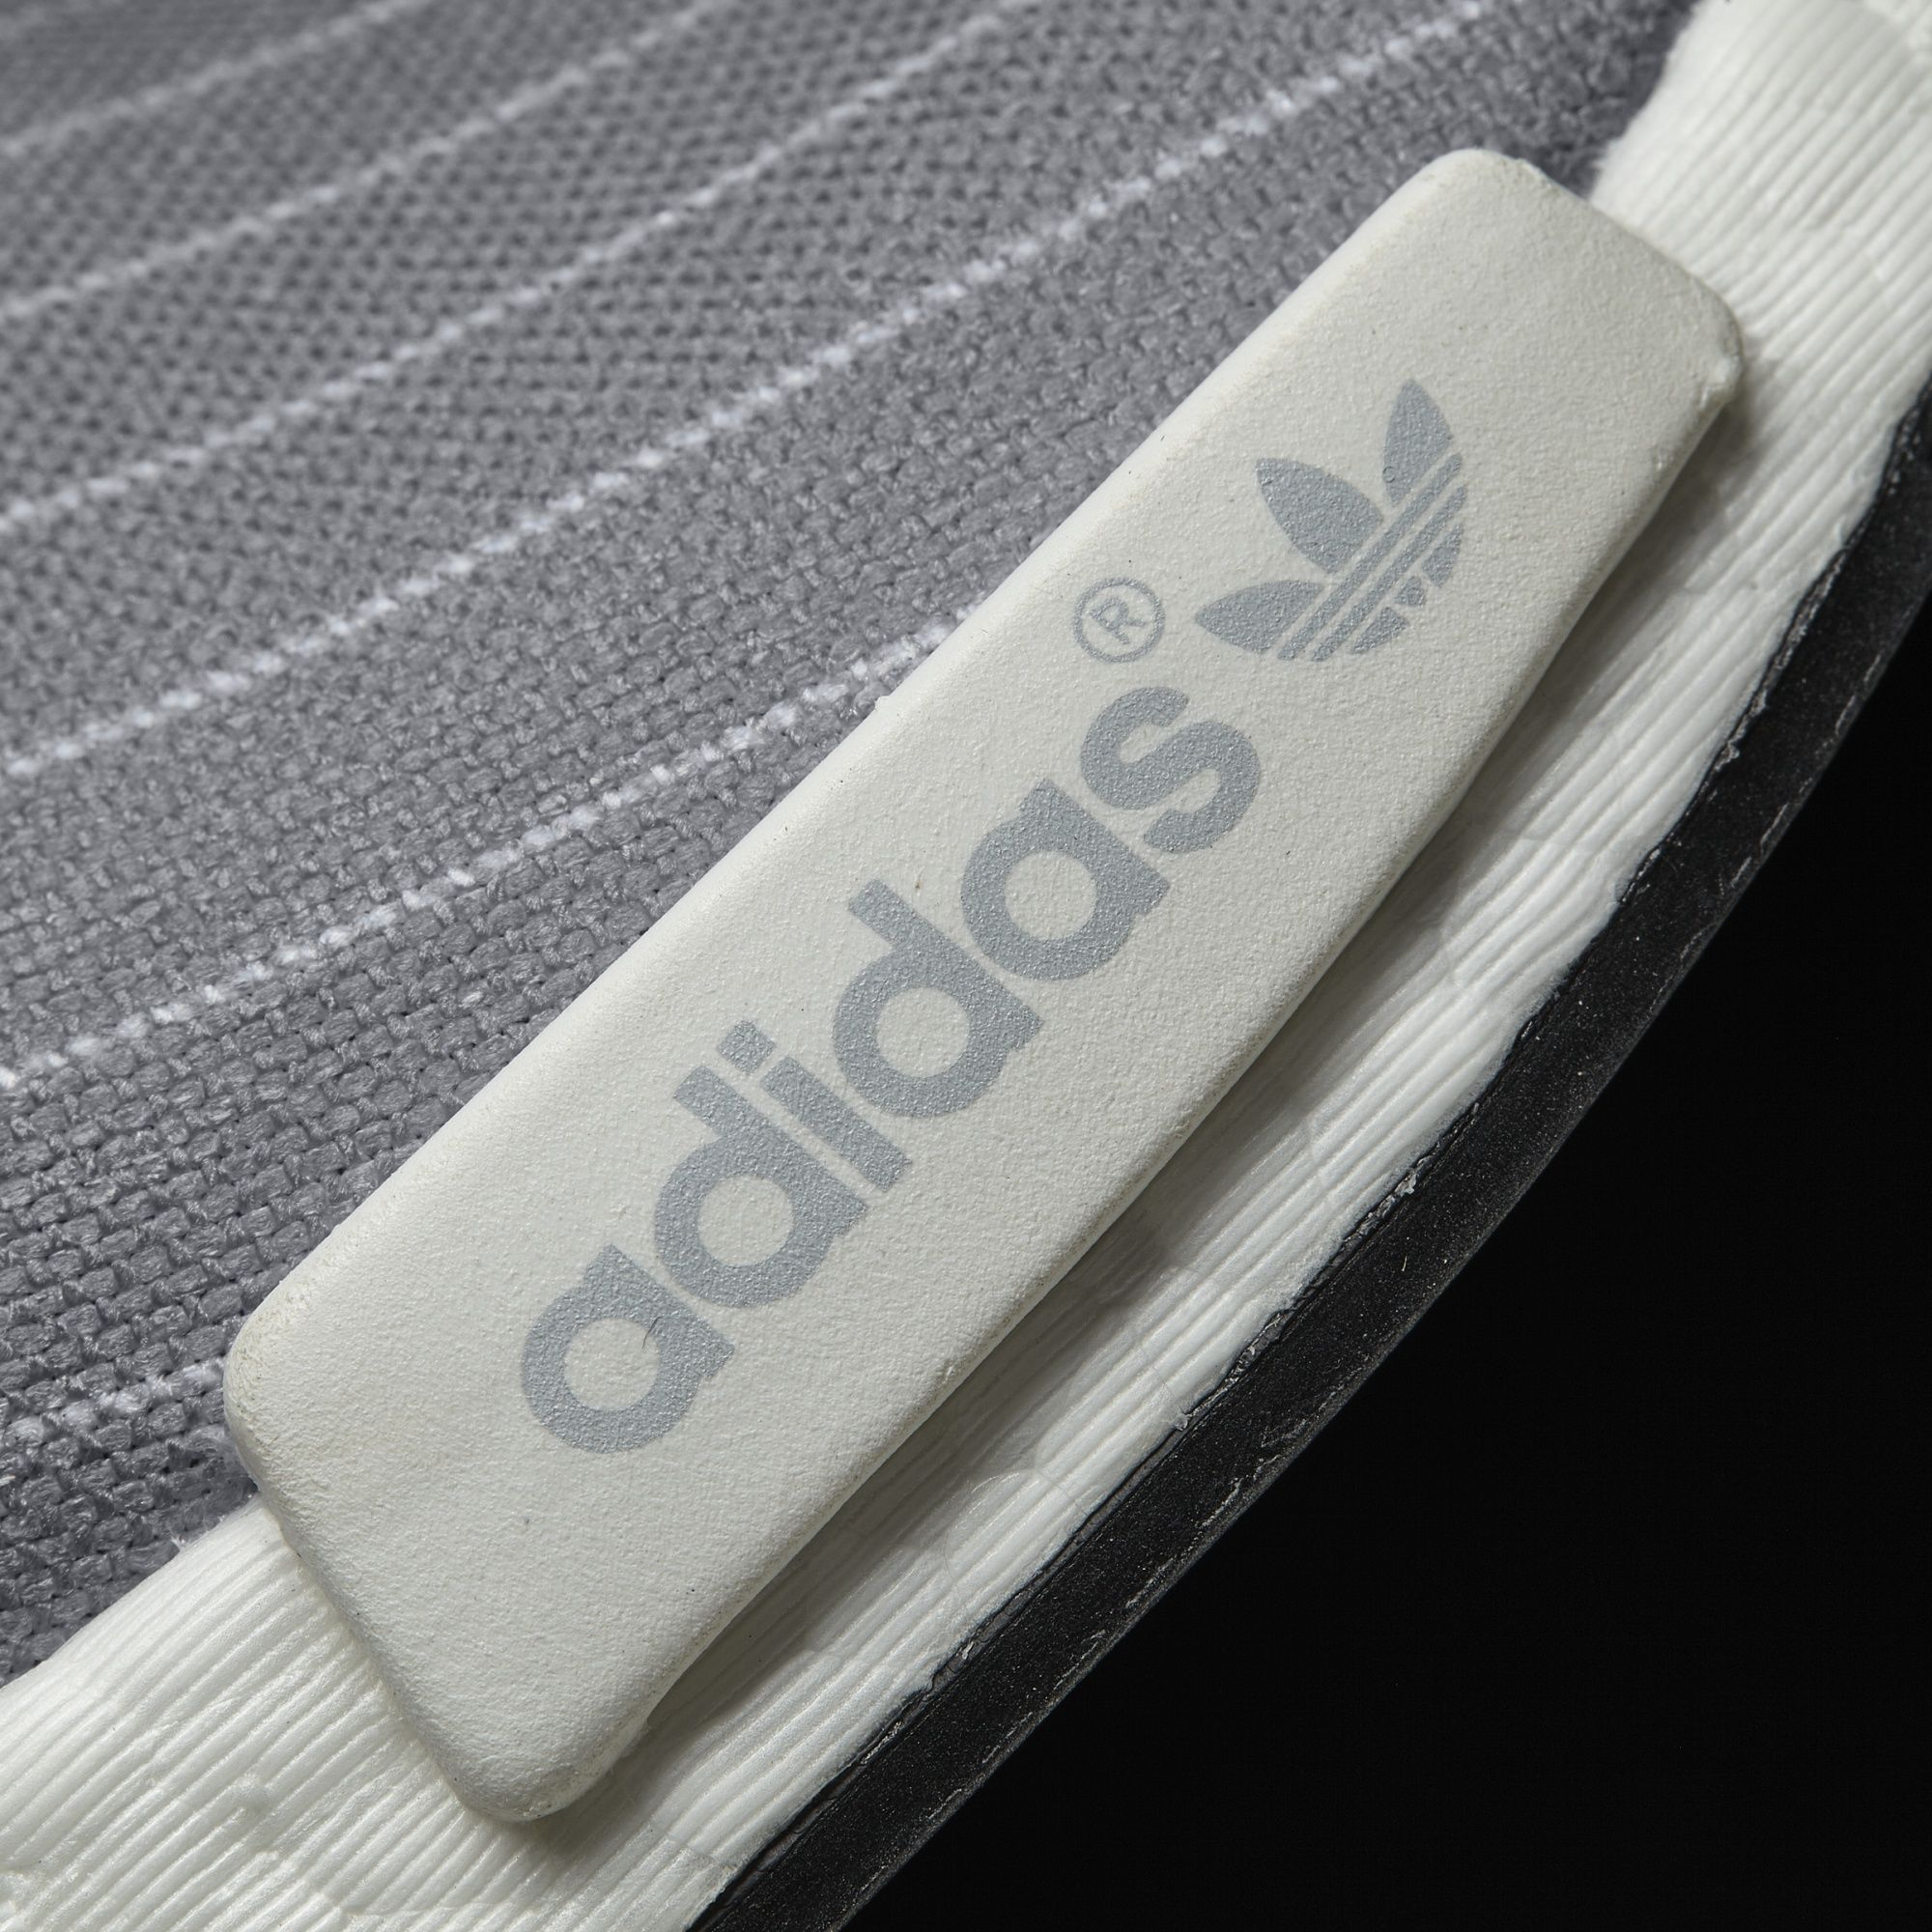 Bedwin Adidas NMD BB3123 Branding